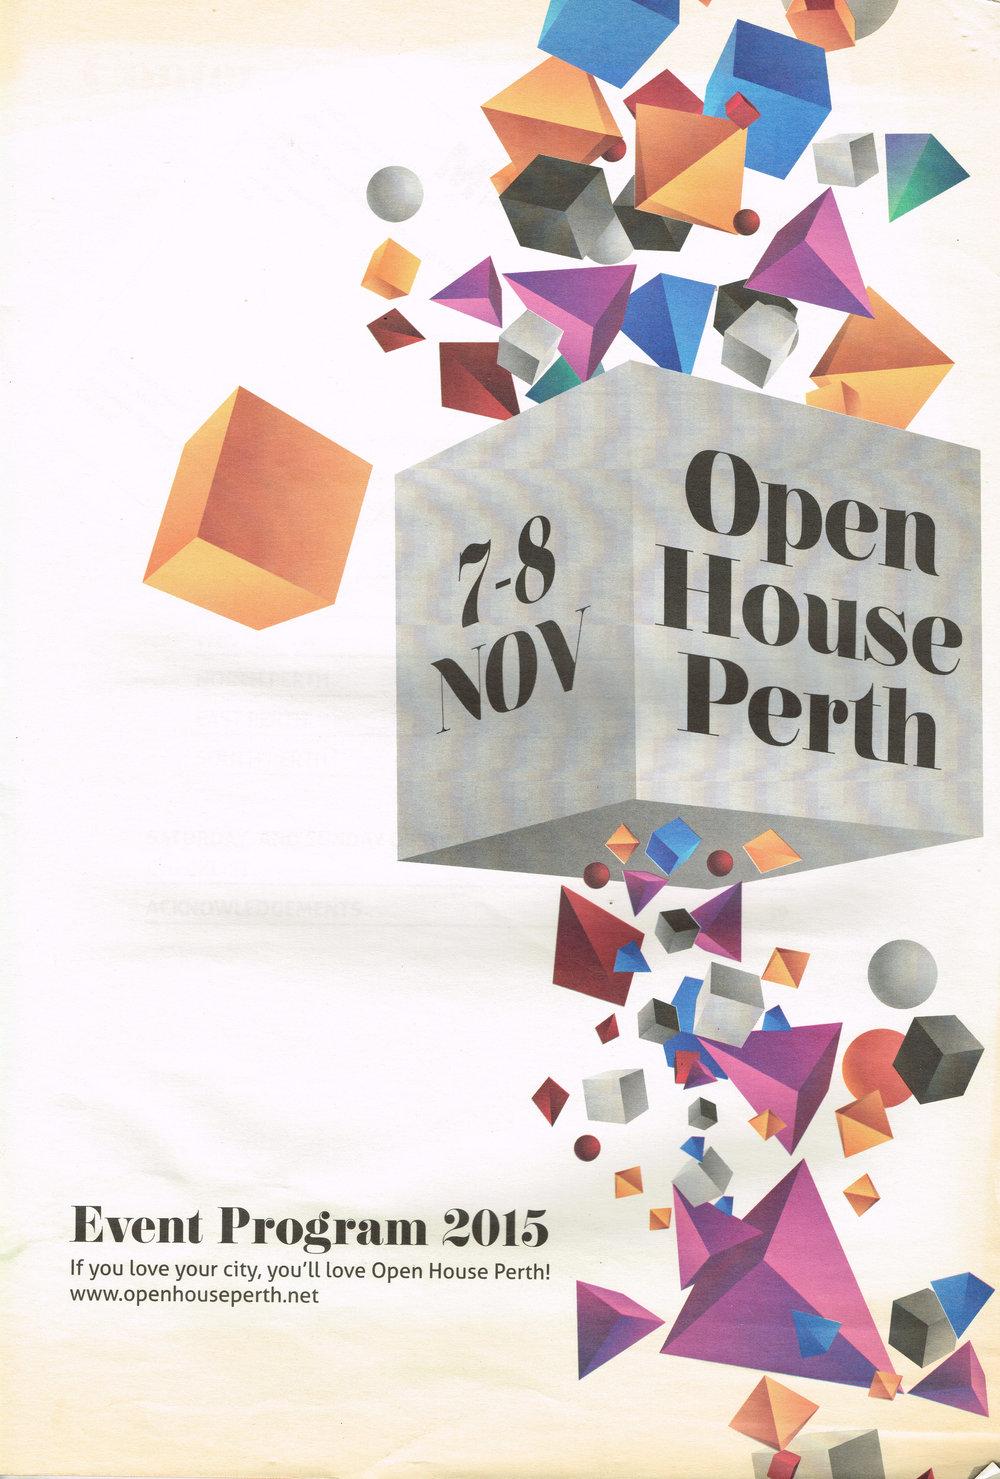 Open House Perth 7-8 Nov : Event Program 2015  Open House Perth